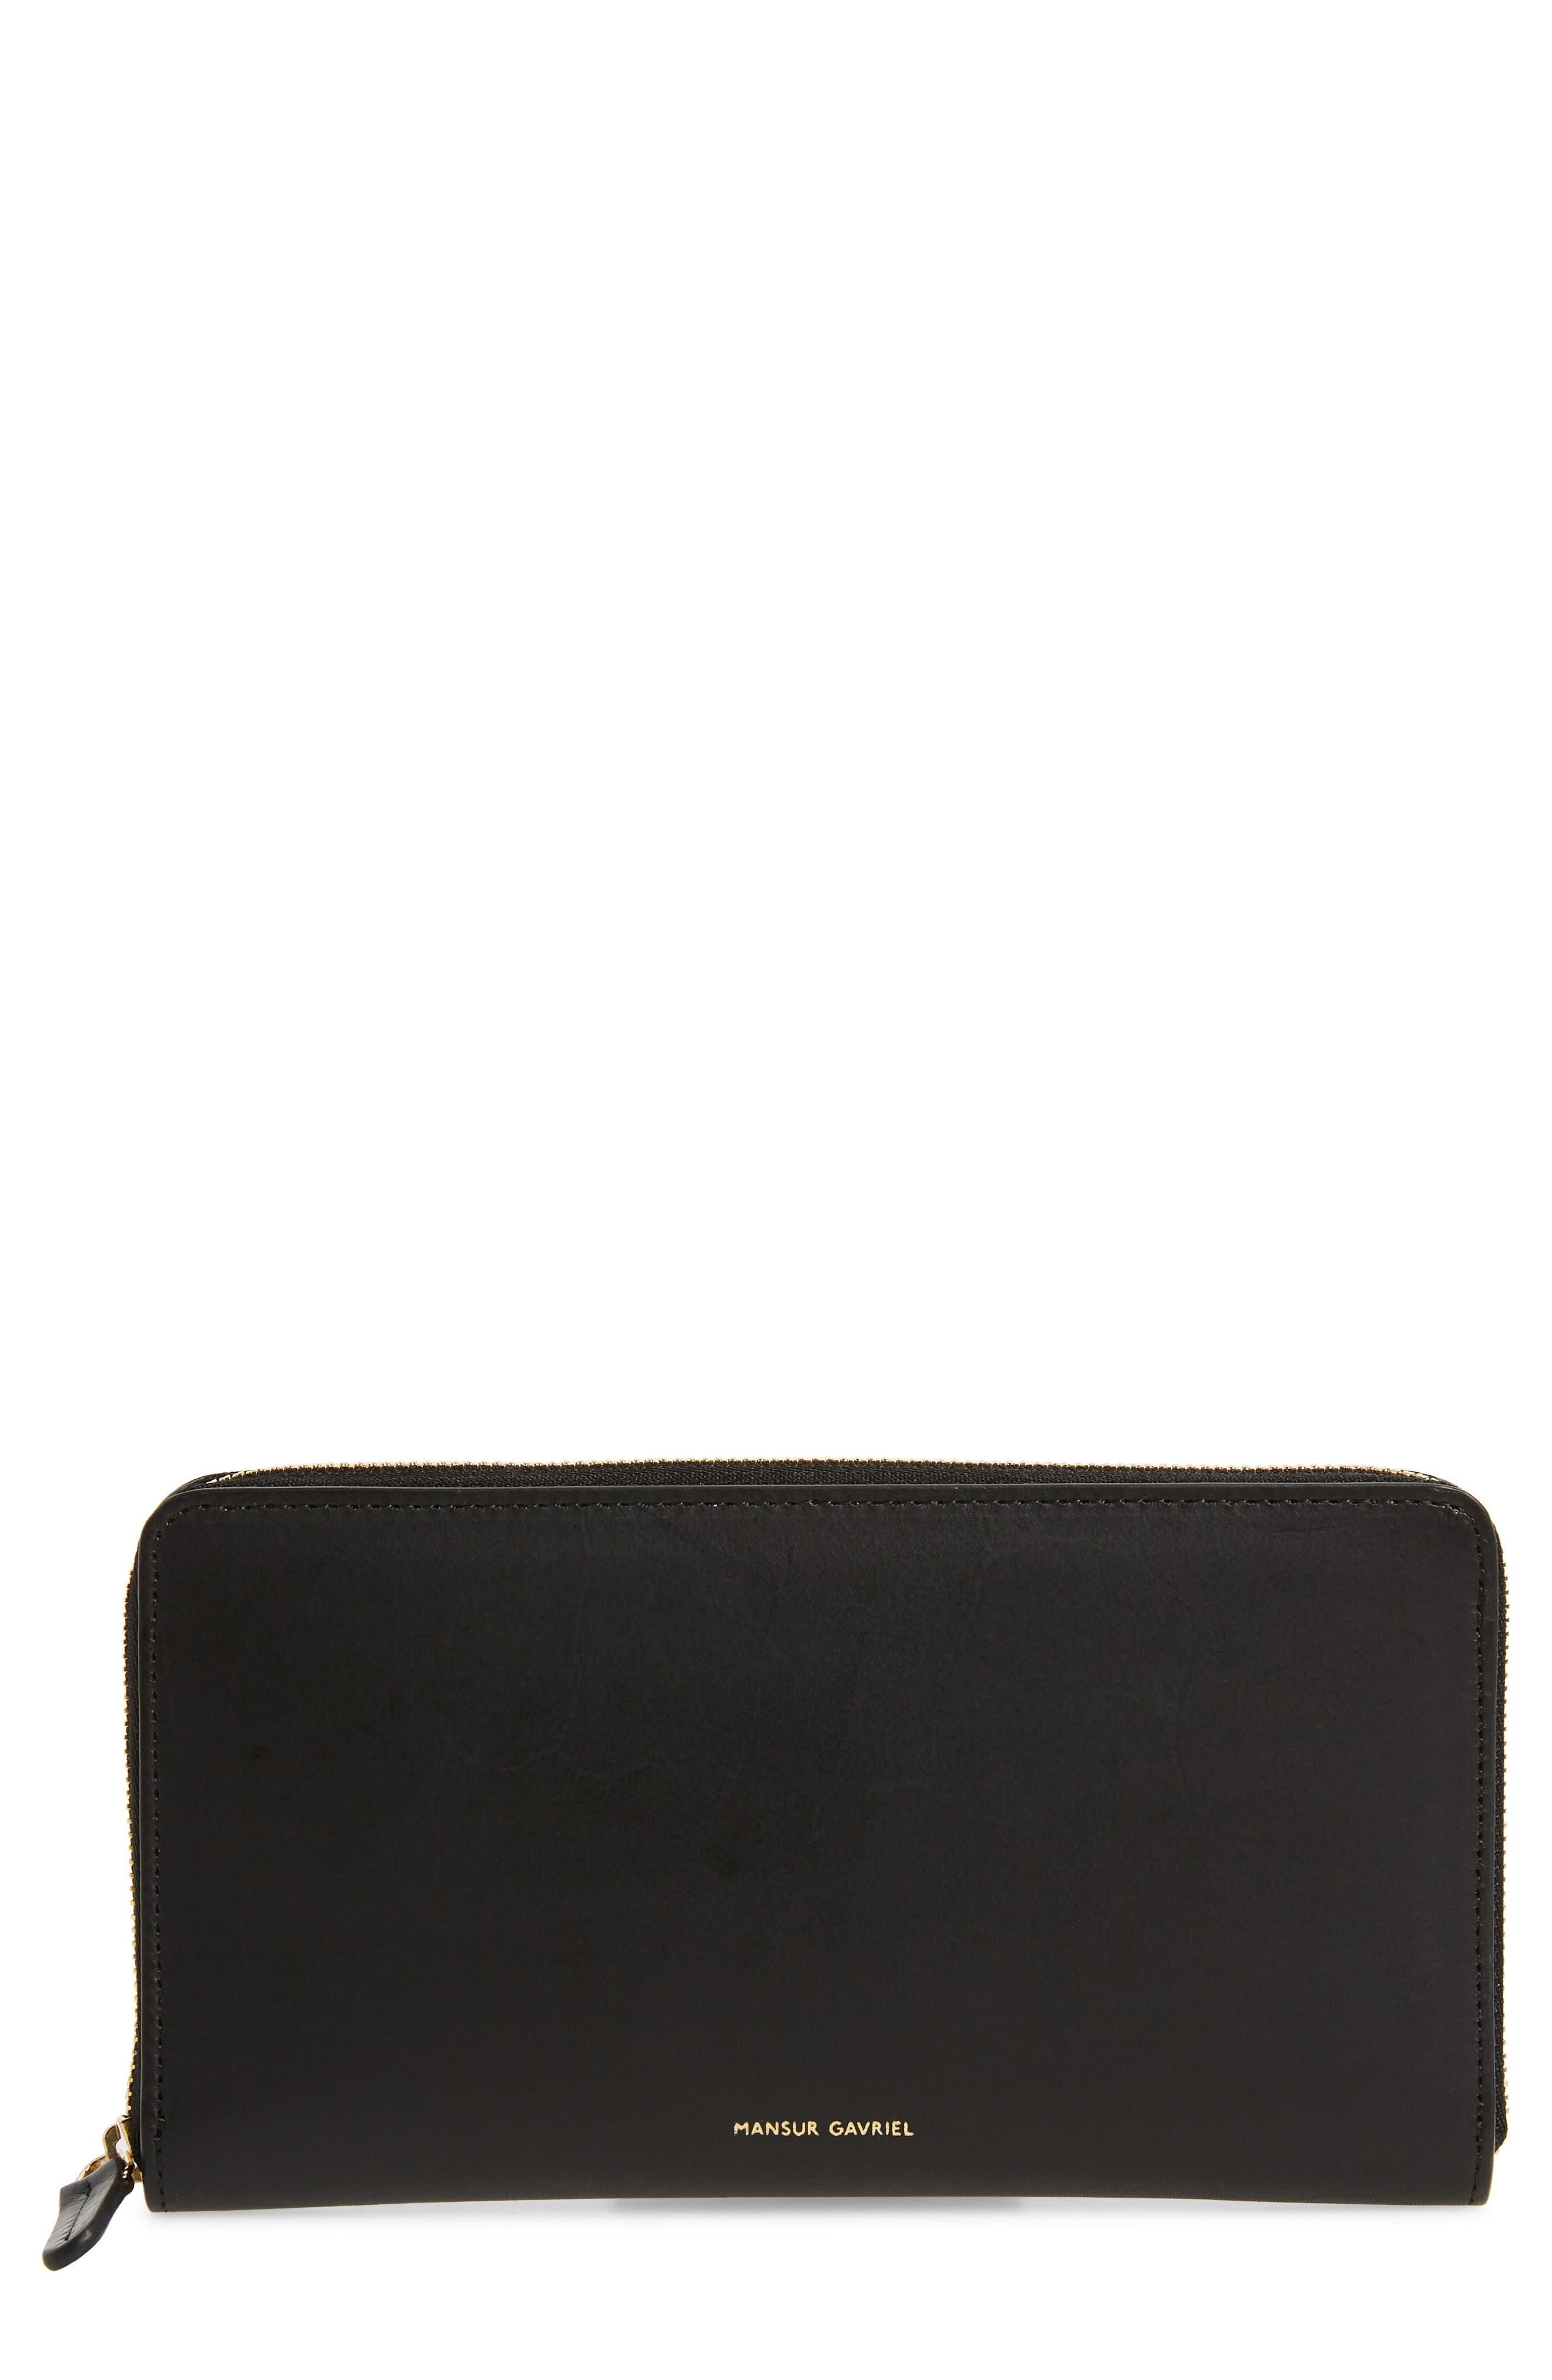 Continental Zip Leather Wallet,                             Main thumbnail 1, color,                             BLACK/ FLAMMA